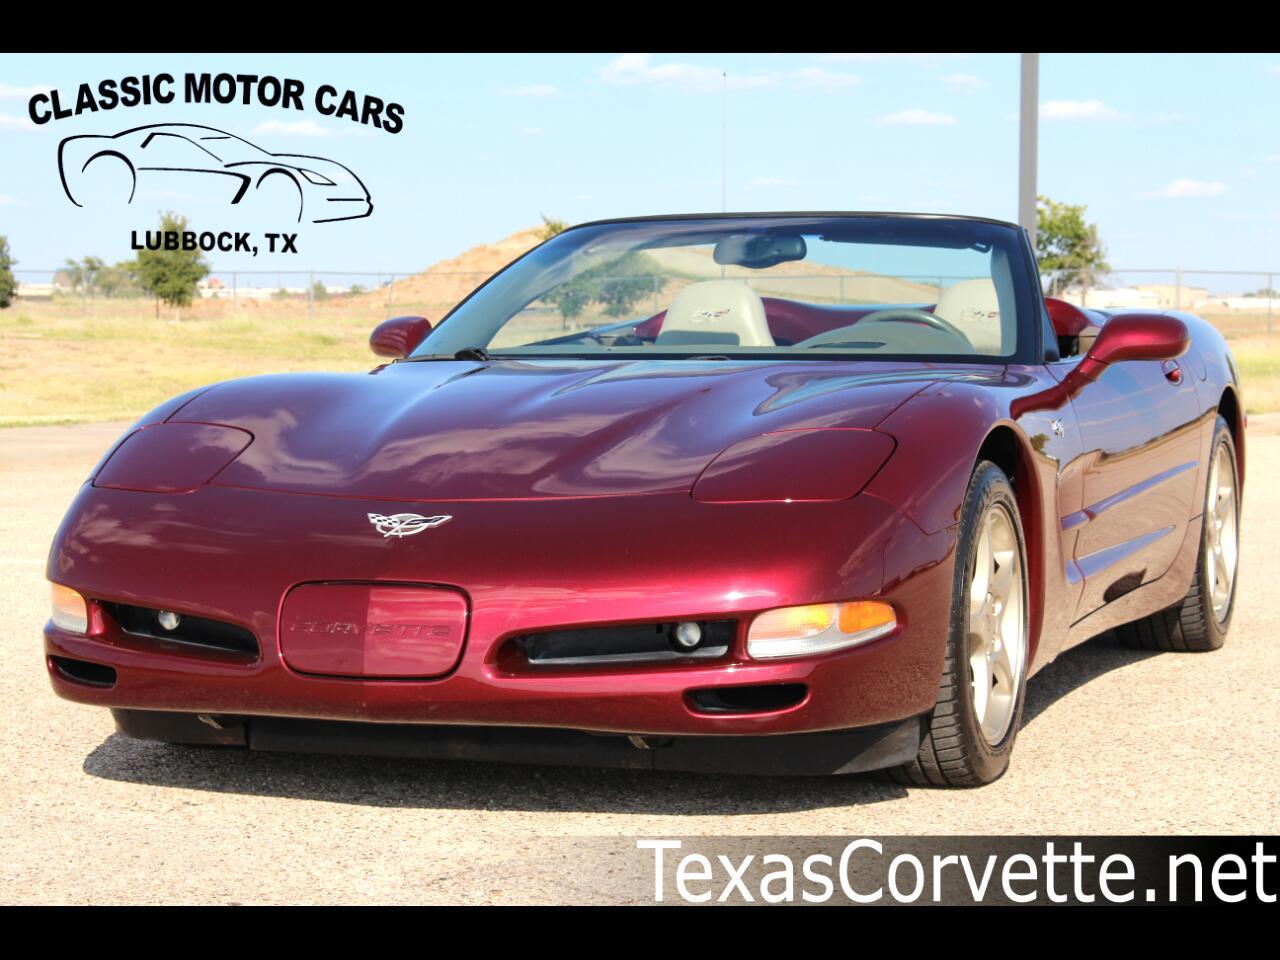 2003 Chevrolet Corvette 2dr Convertible 50th Anniversary